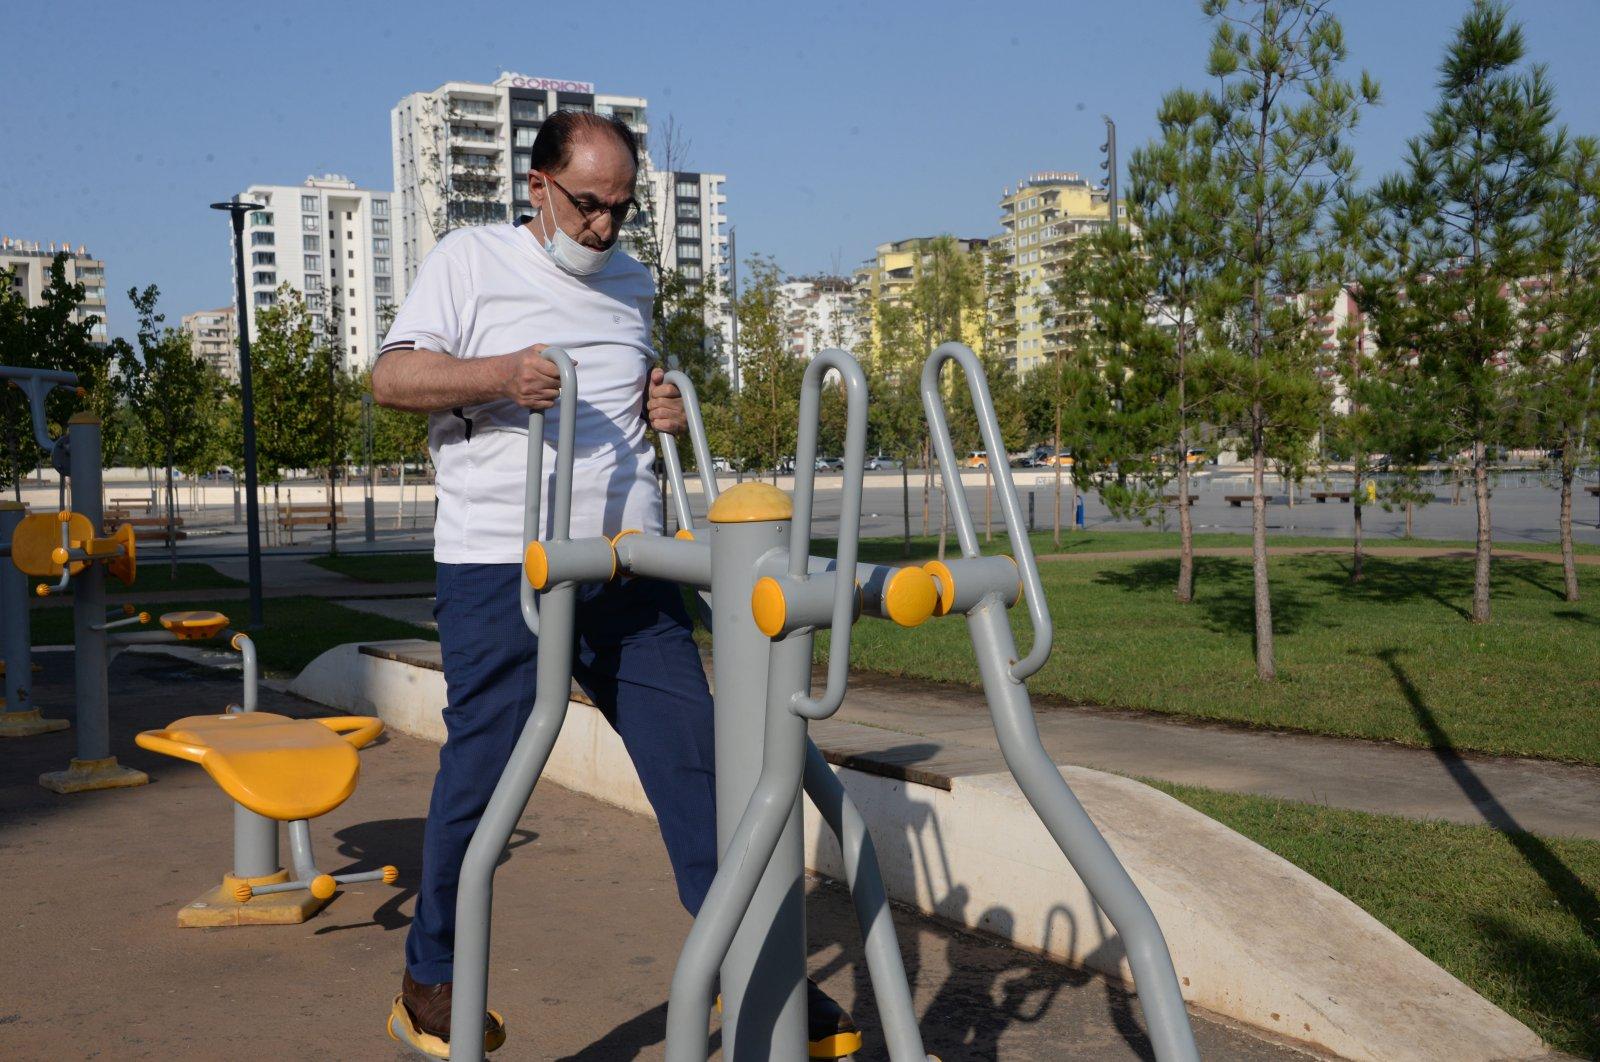 Şükrü Abay exercises in a park in Diyarbakır, southeastern Turkey, Sept. 23, 2020. (DHA Photo)